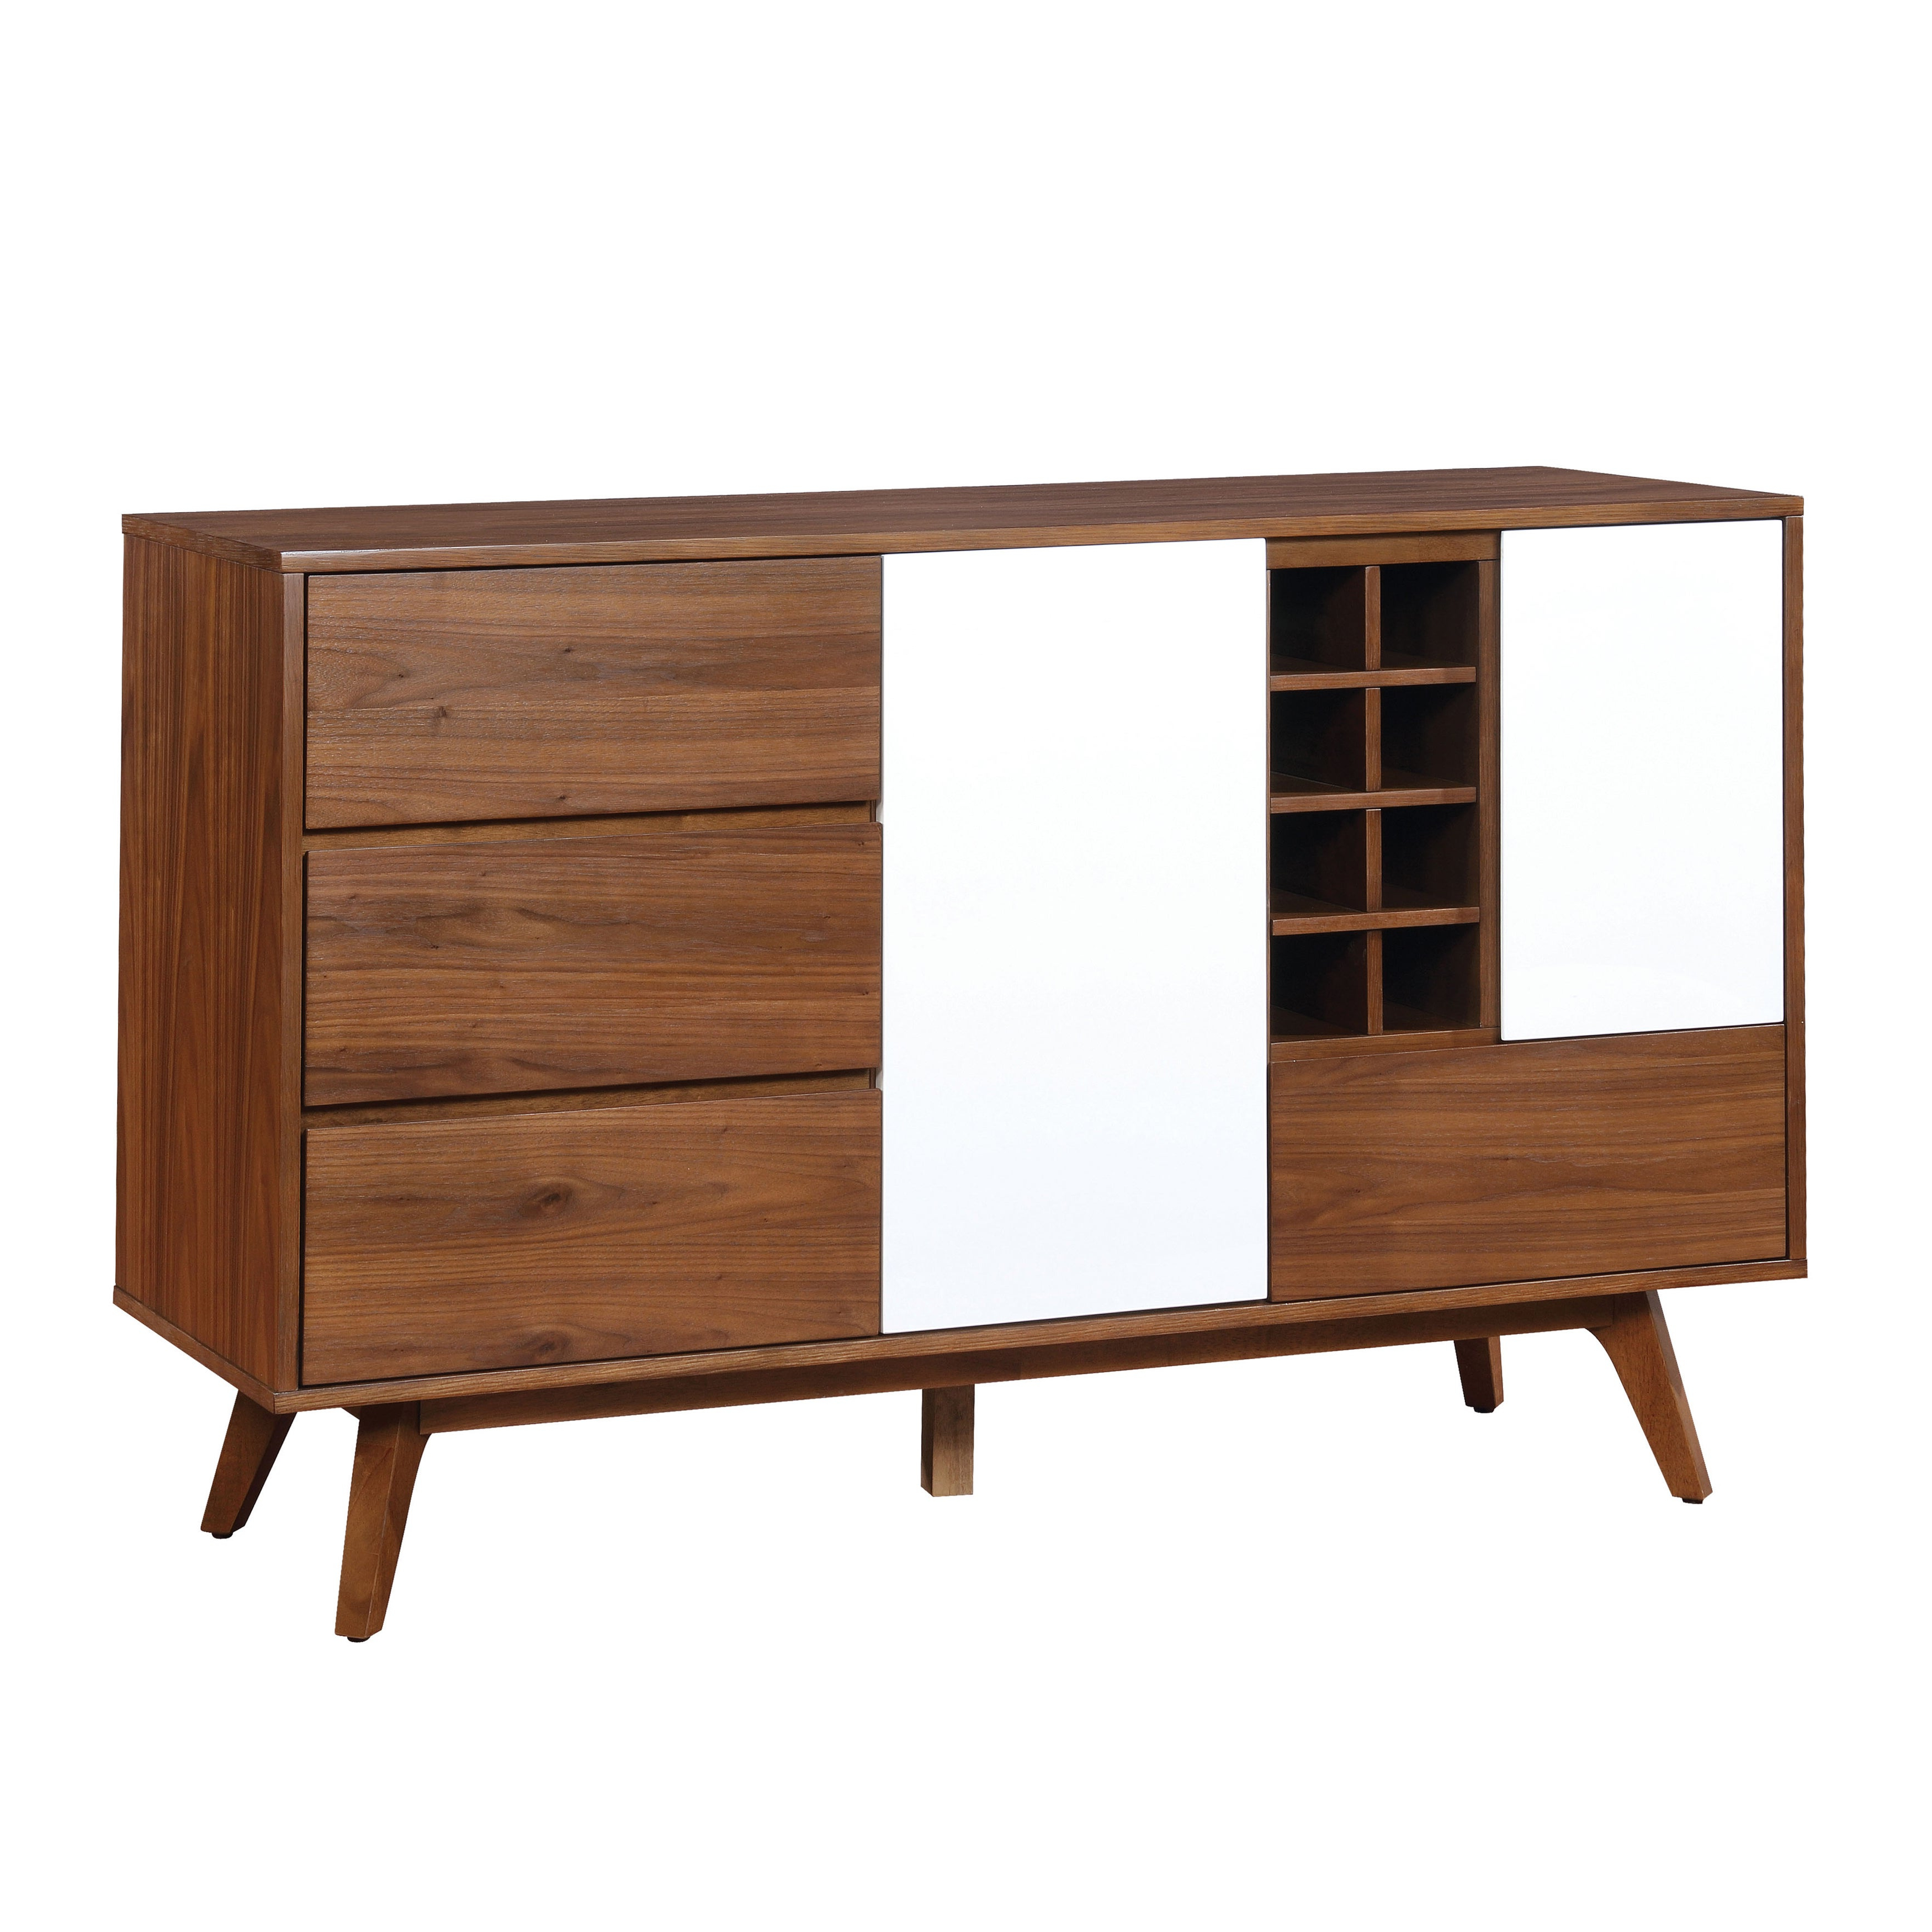 Furniture Of America Liman Mid Century Modern 2 Tone Oak/white  Multi Storage Buffet/wine Cabinet Regarding Light White Oak Two Tone Modern Buffets (View 6 of 20)